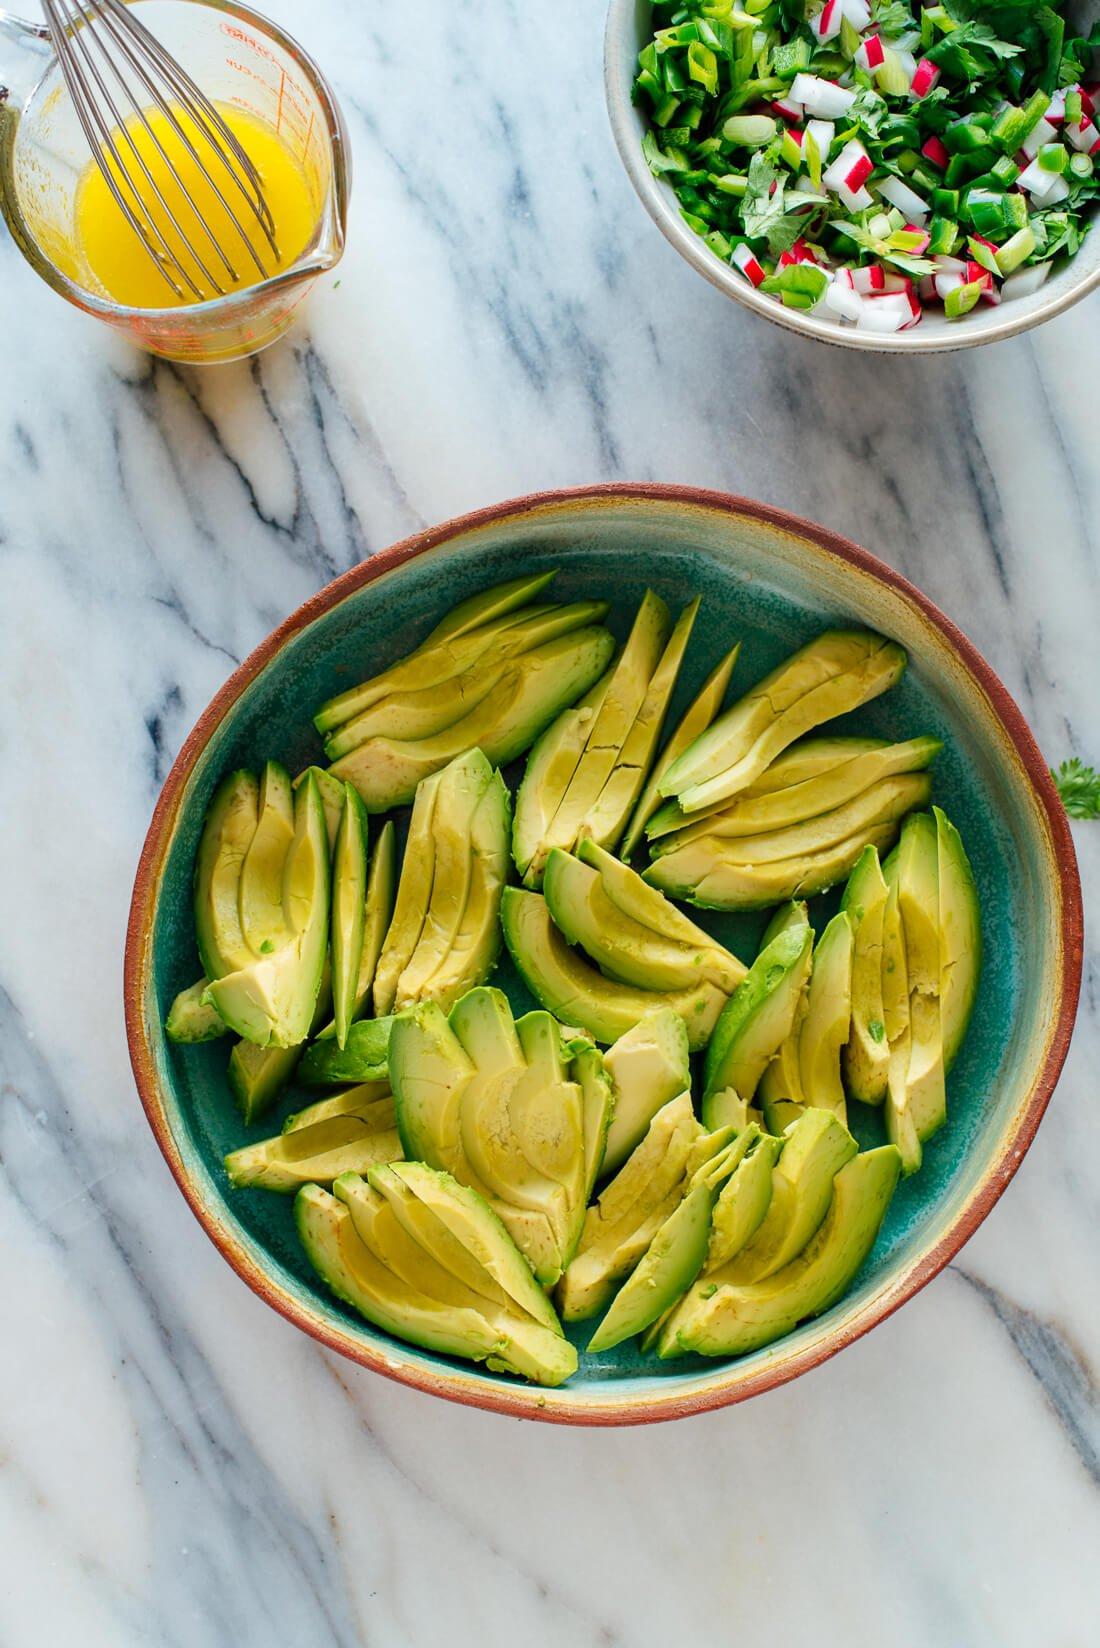 sliced avocados for salad